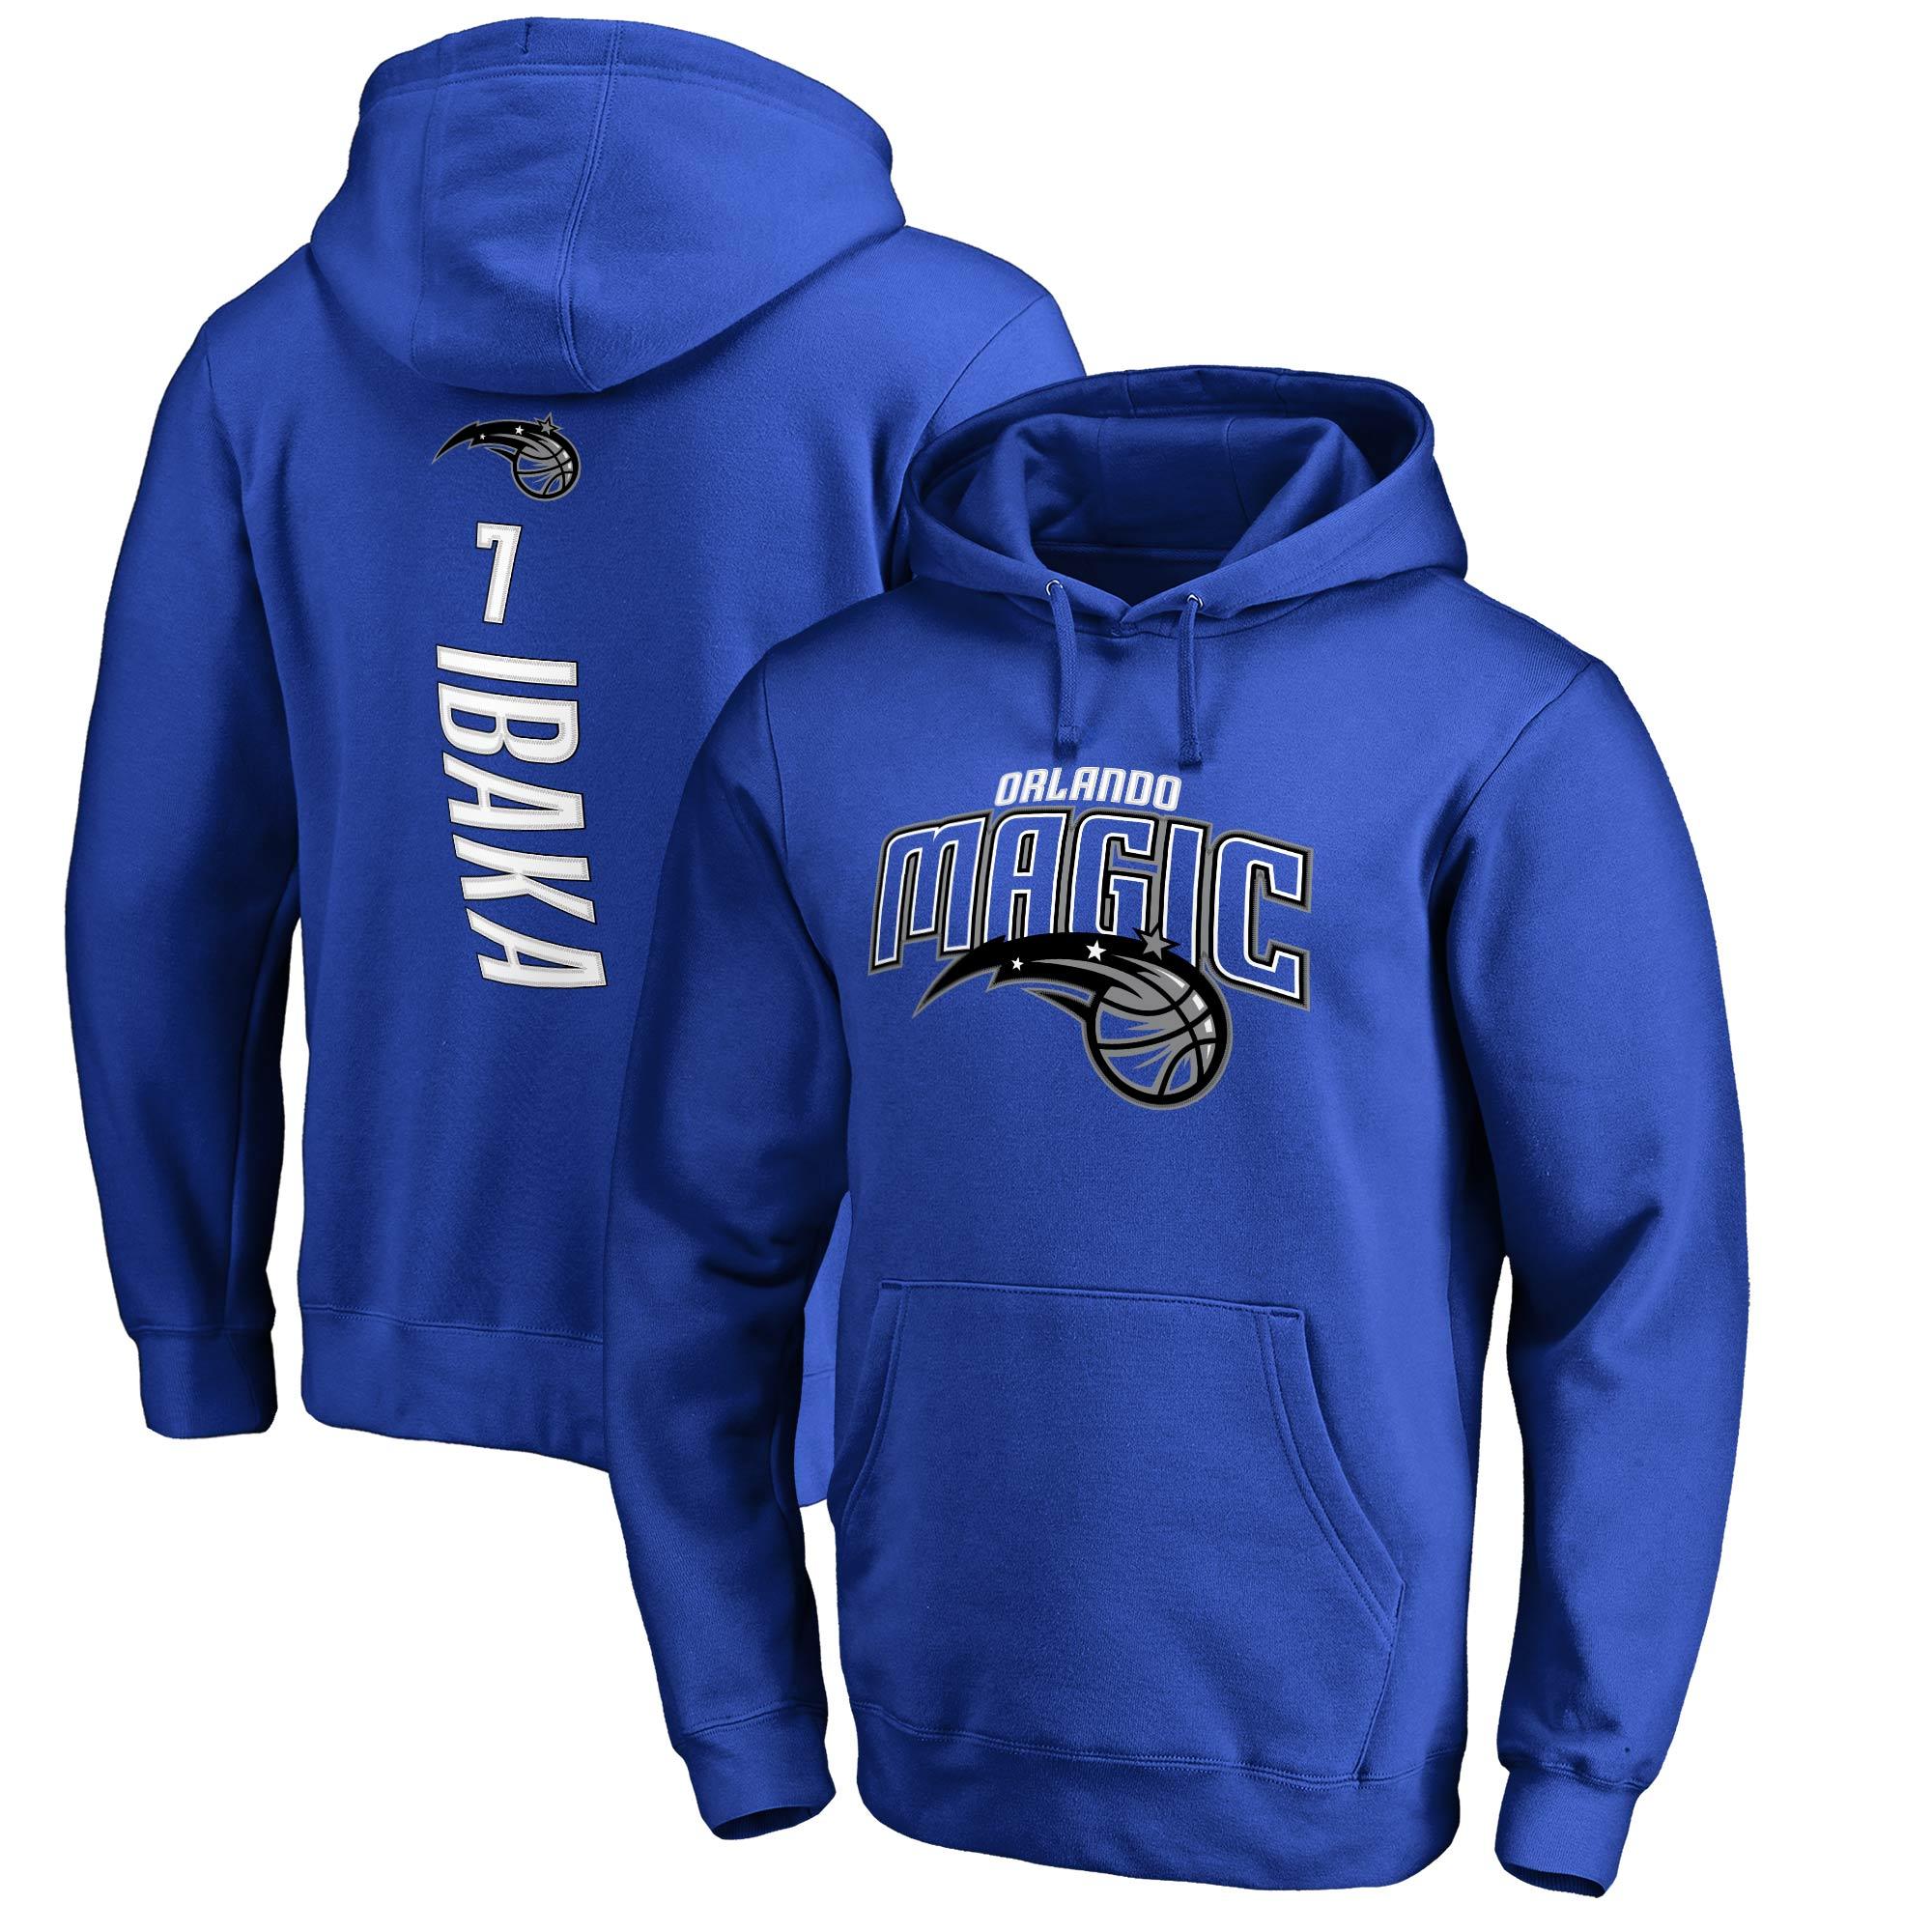 Serge Ibaka Orlando Magic Fanatics Branded Backer 3 Pullover Hoodie - Blue